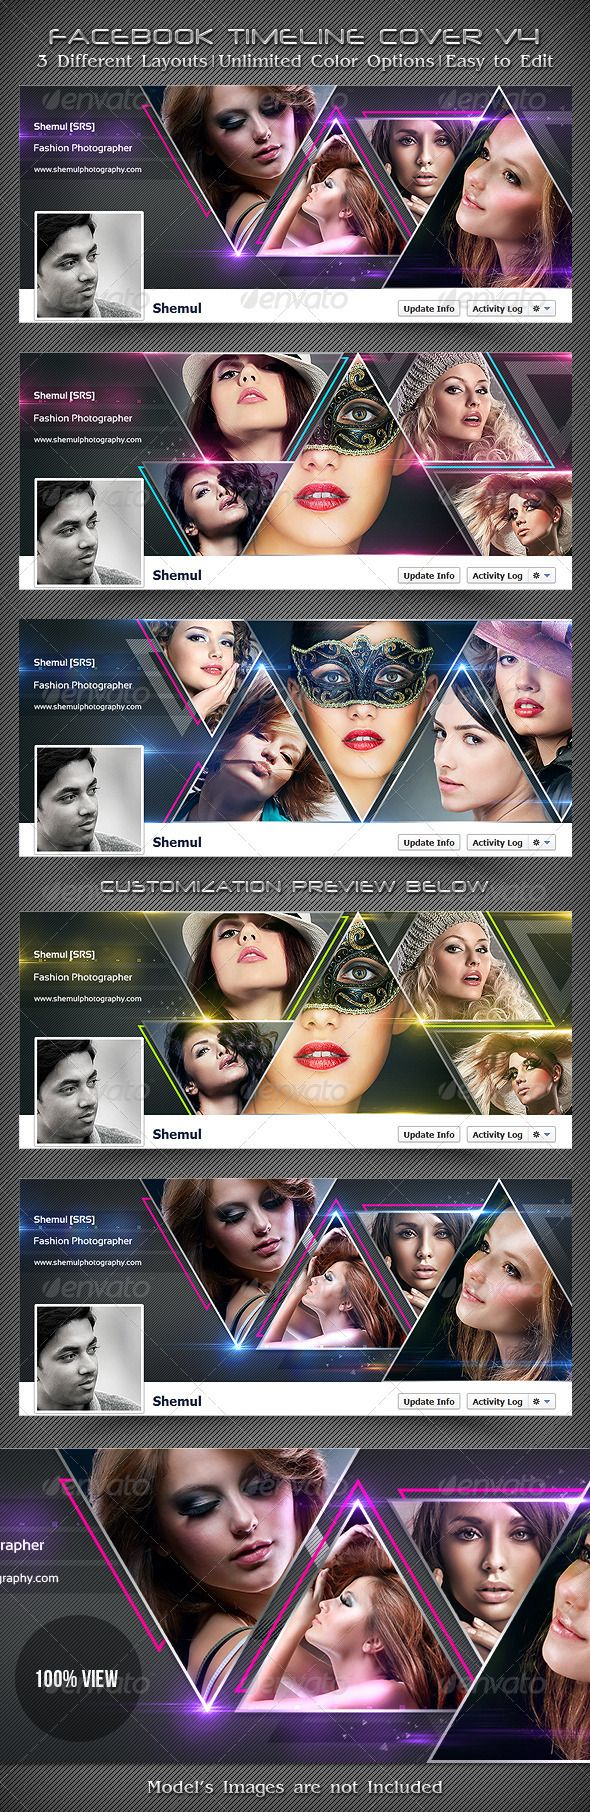 #photographer's Fb #timeline Cover V4 - Facebook Timeline Covers #social  Media